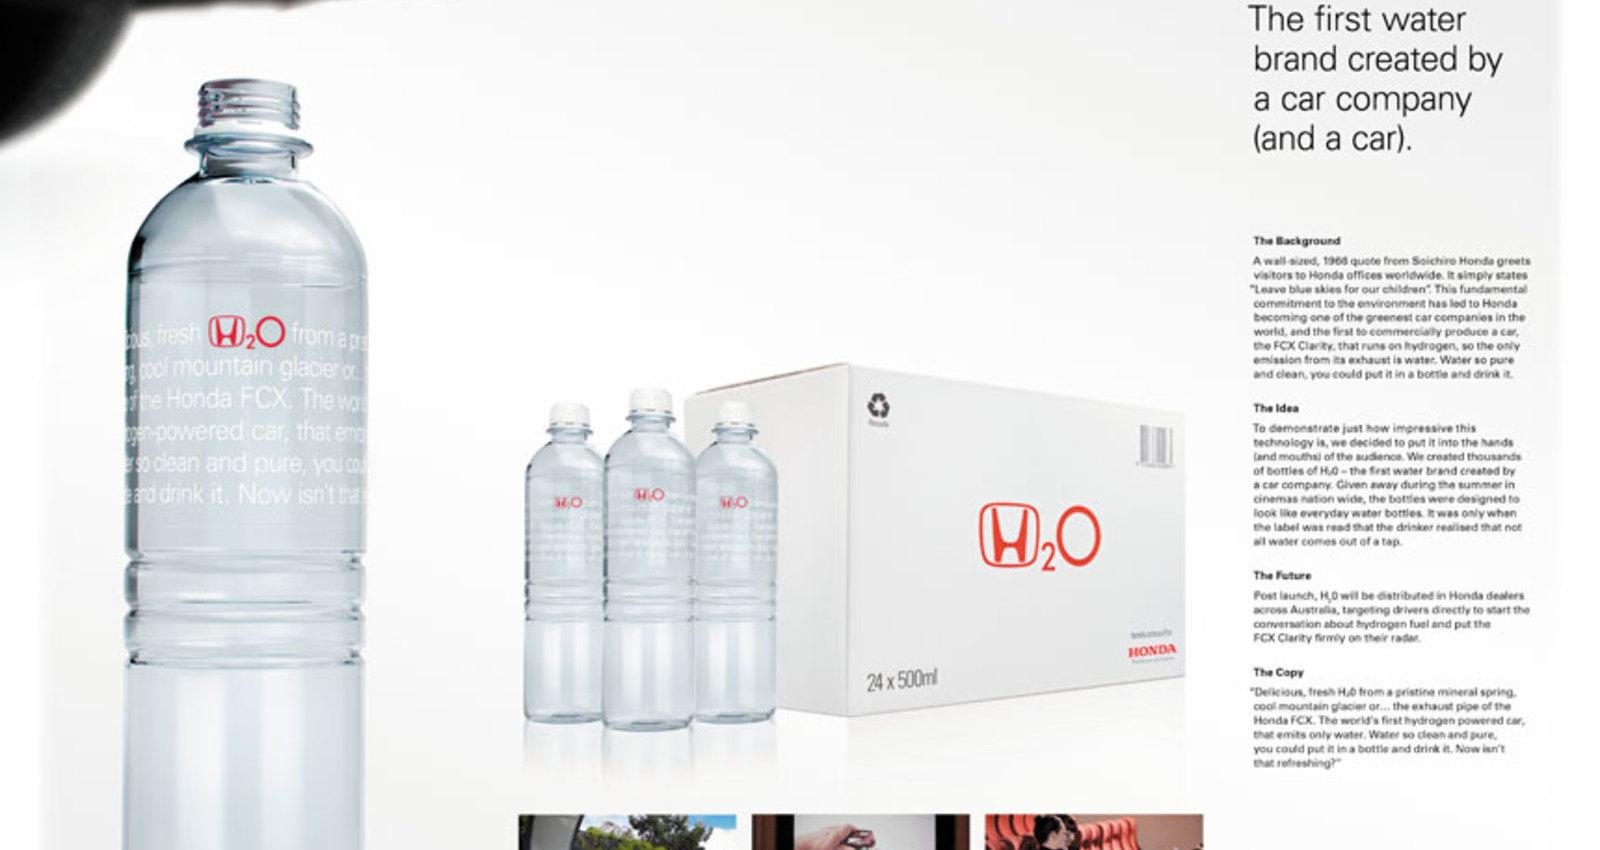 HONDA H2O